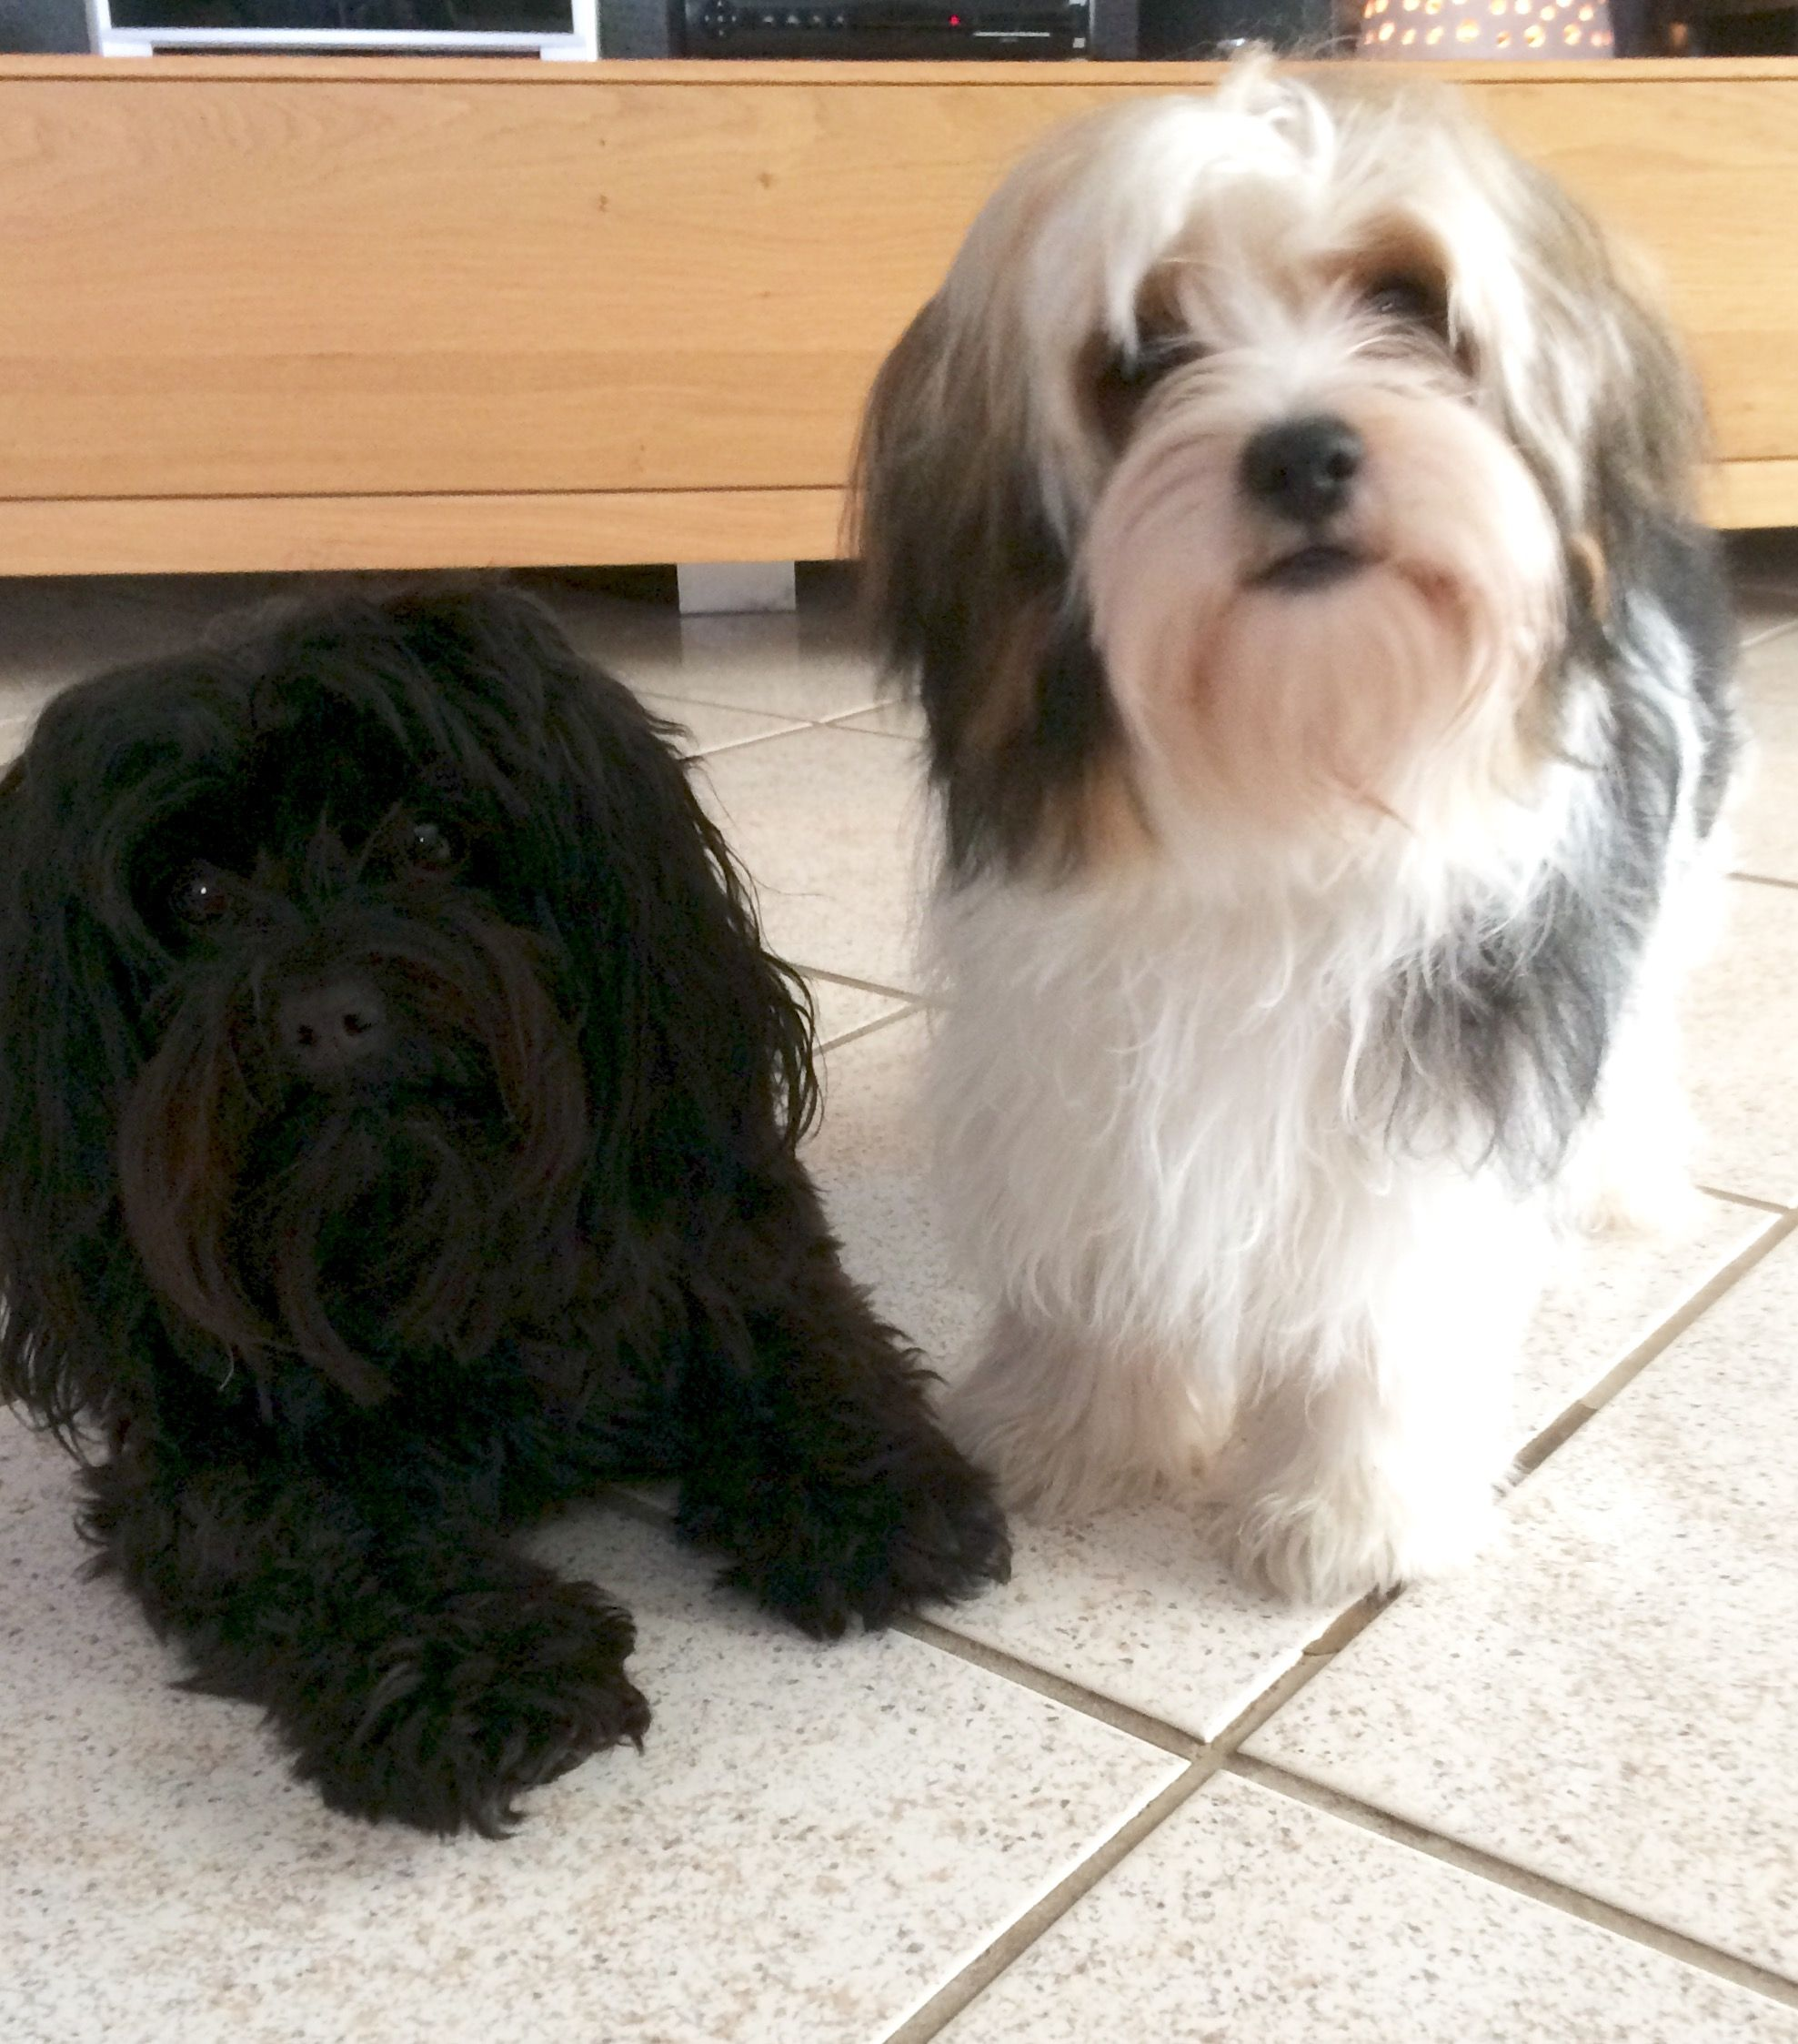 Emil Und Amigo Hunde Lustige Hunde Hundepension